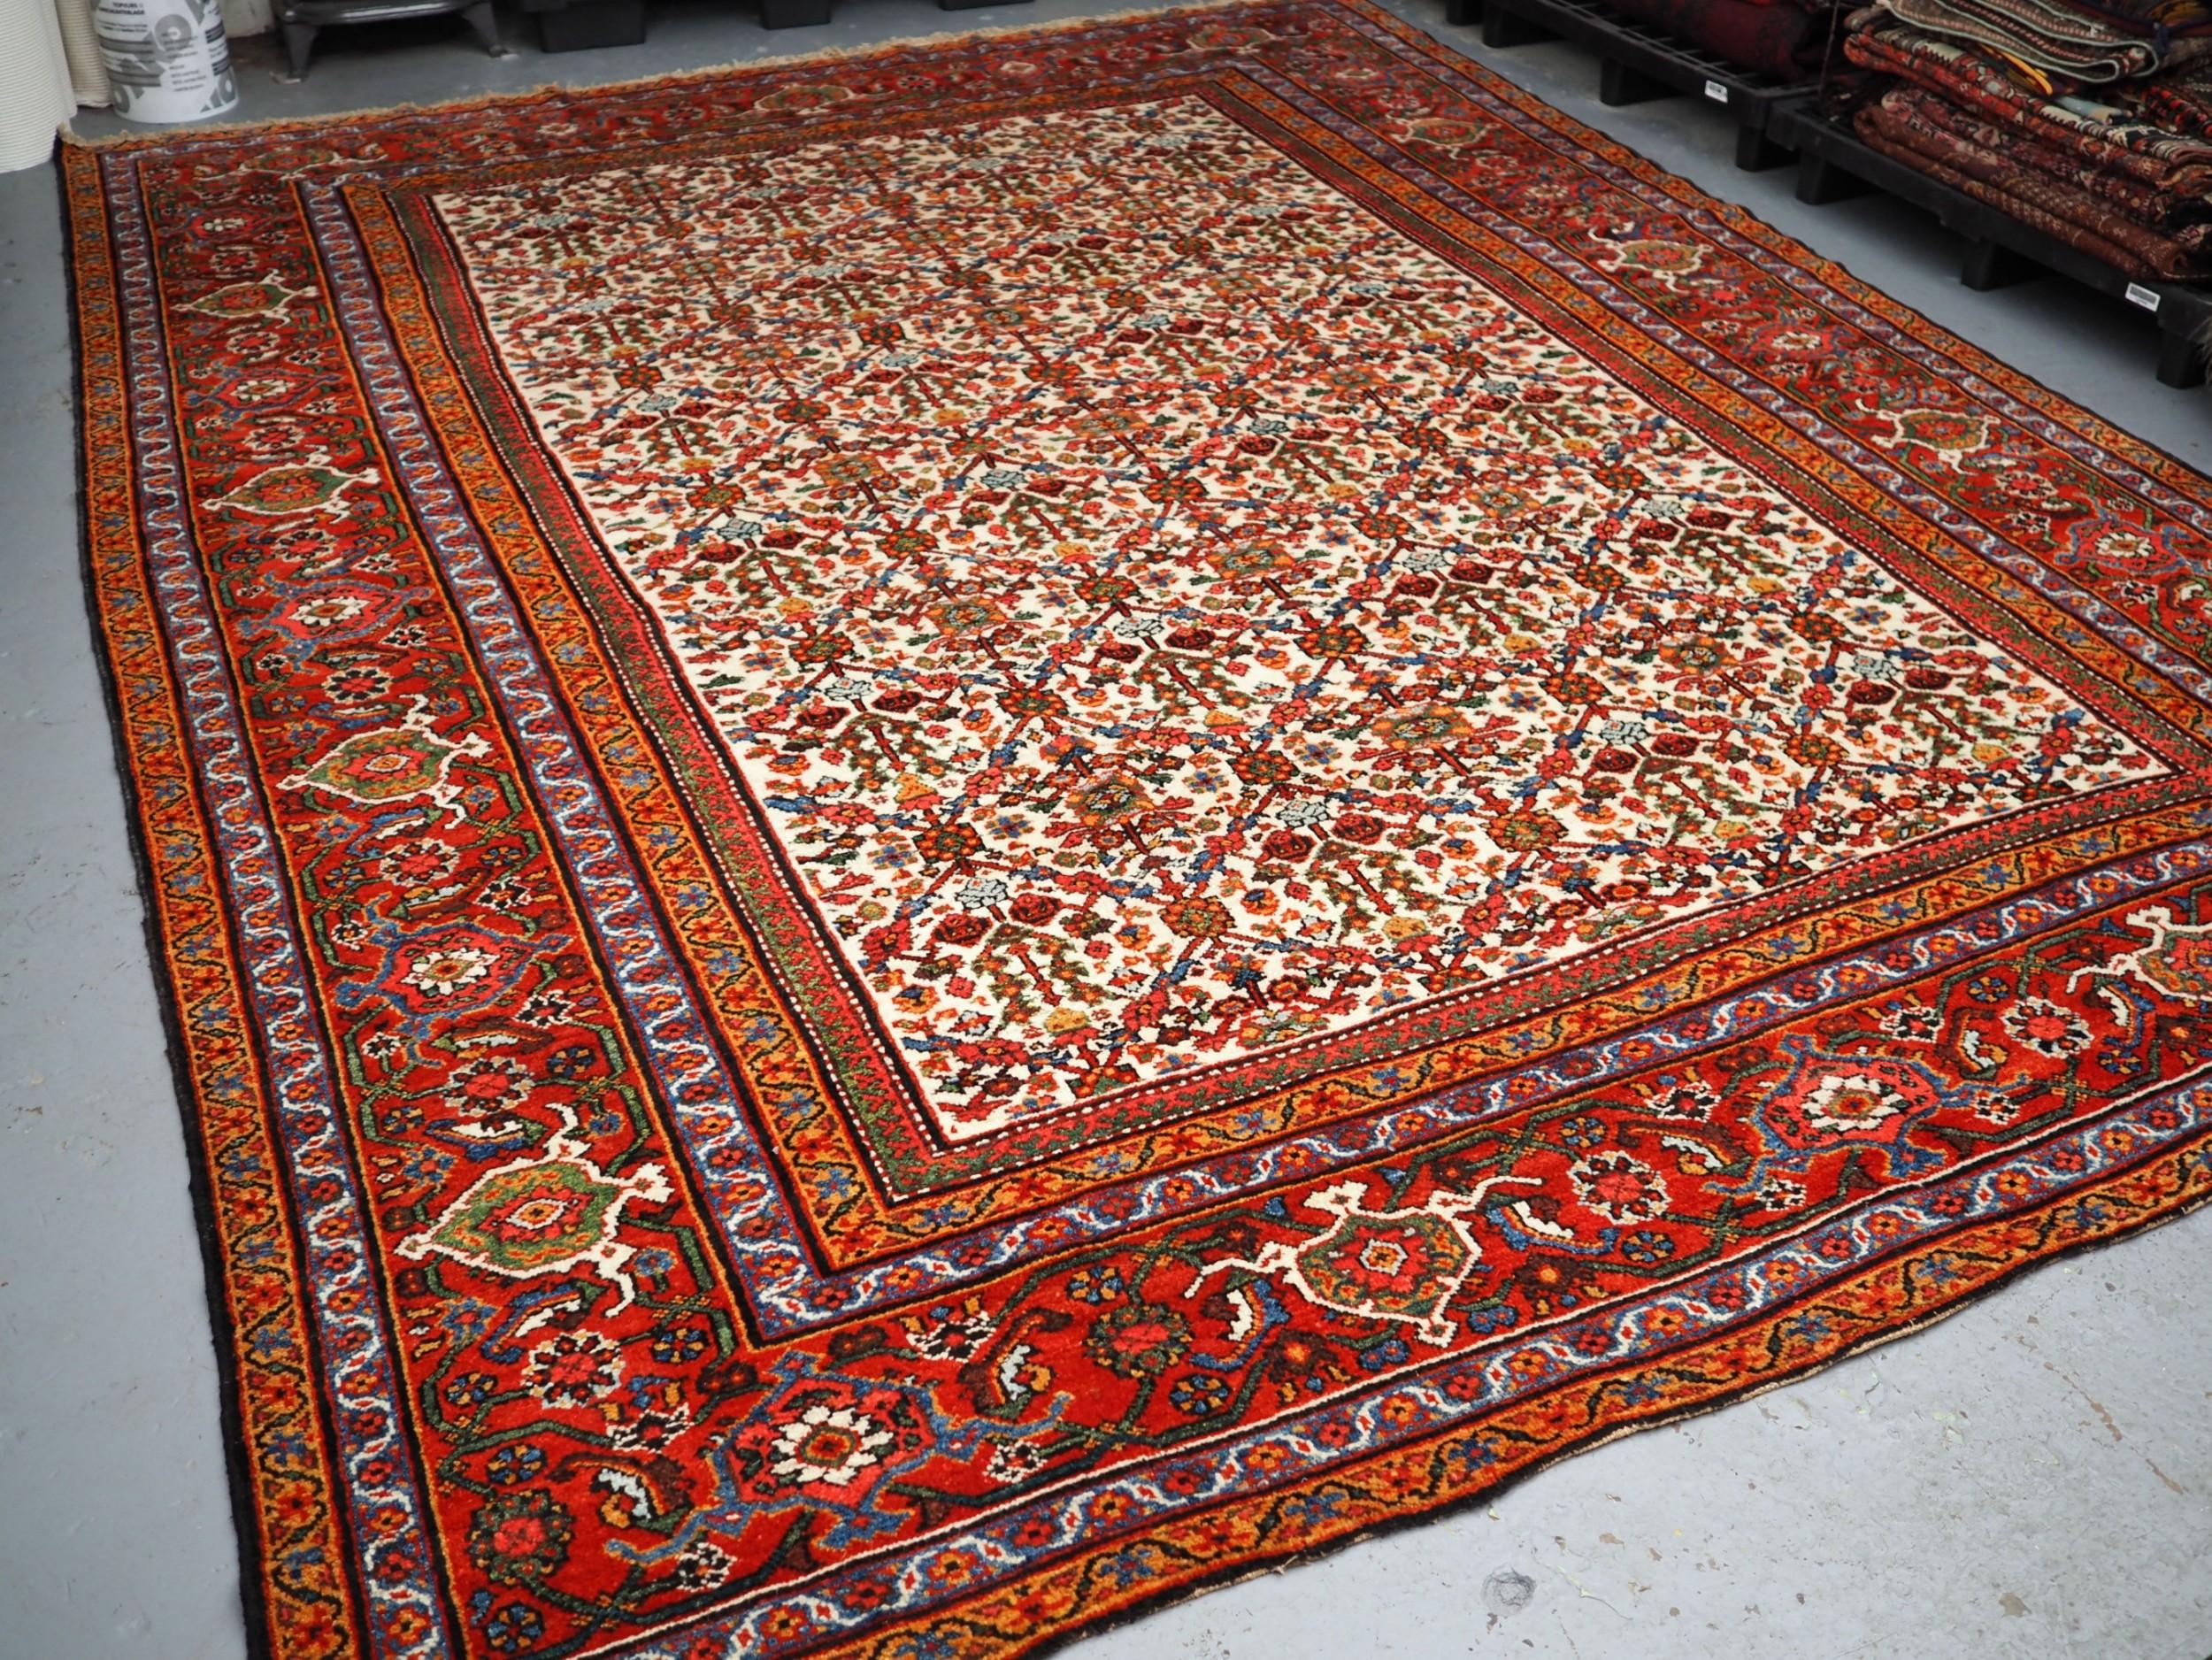 antique feraghan region village carpet perfect condition circa 190020